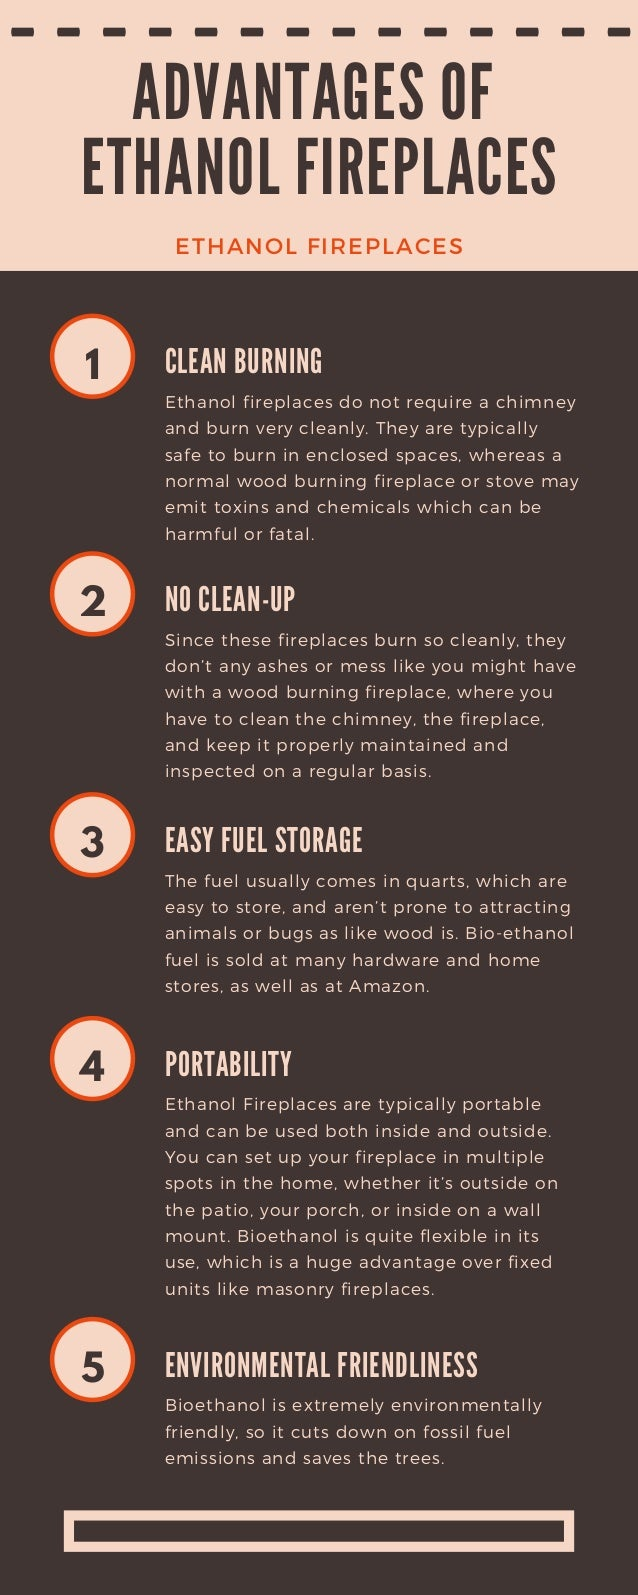 Stupendous Advantages Of Ethanol Fireplaces Download Free Architecture Designs Scobabritishbridgeorg